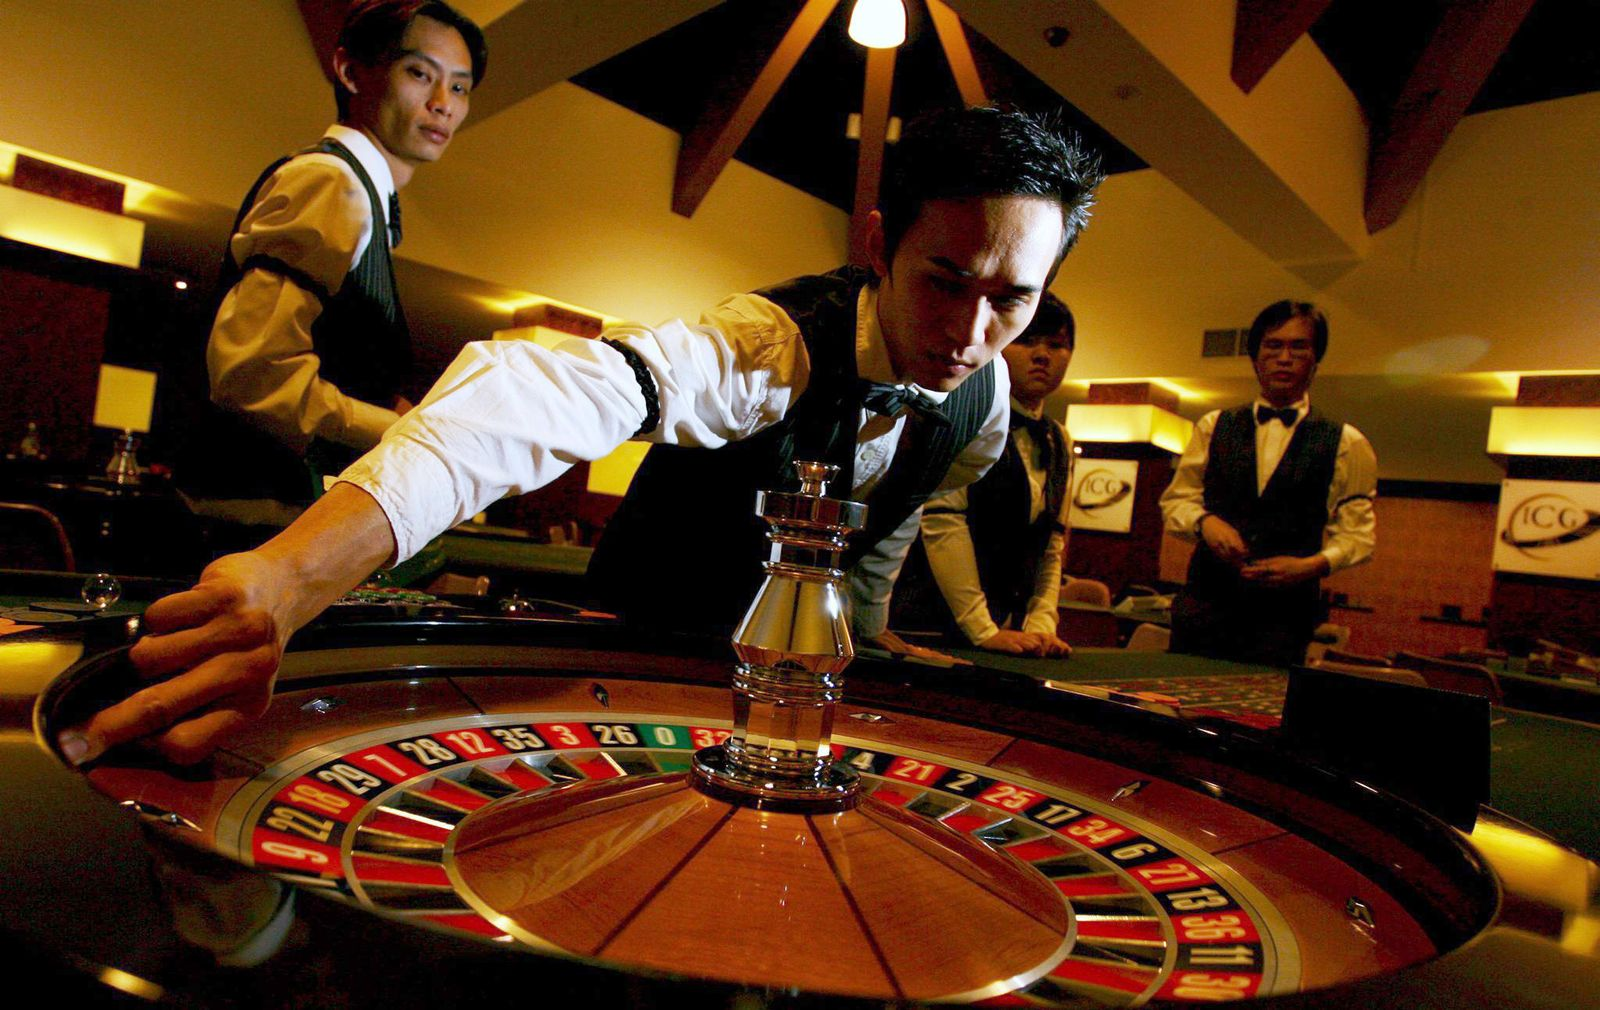 Casino / Croupier